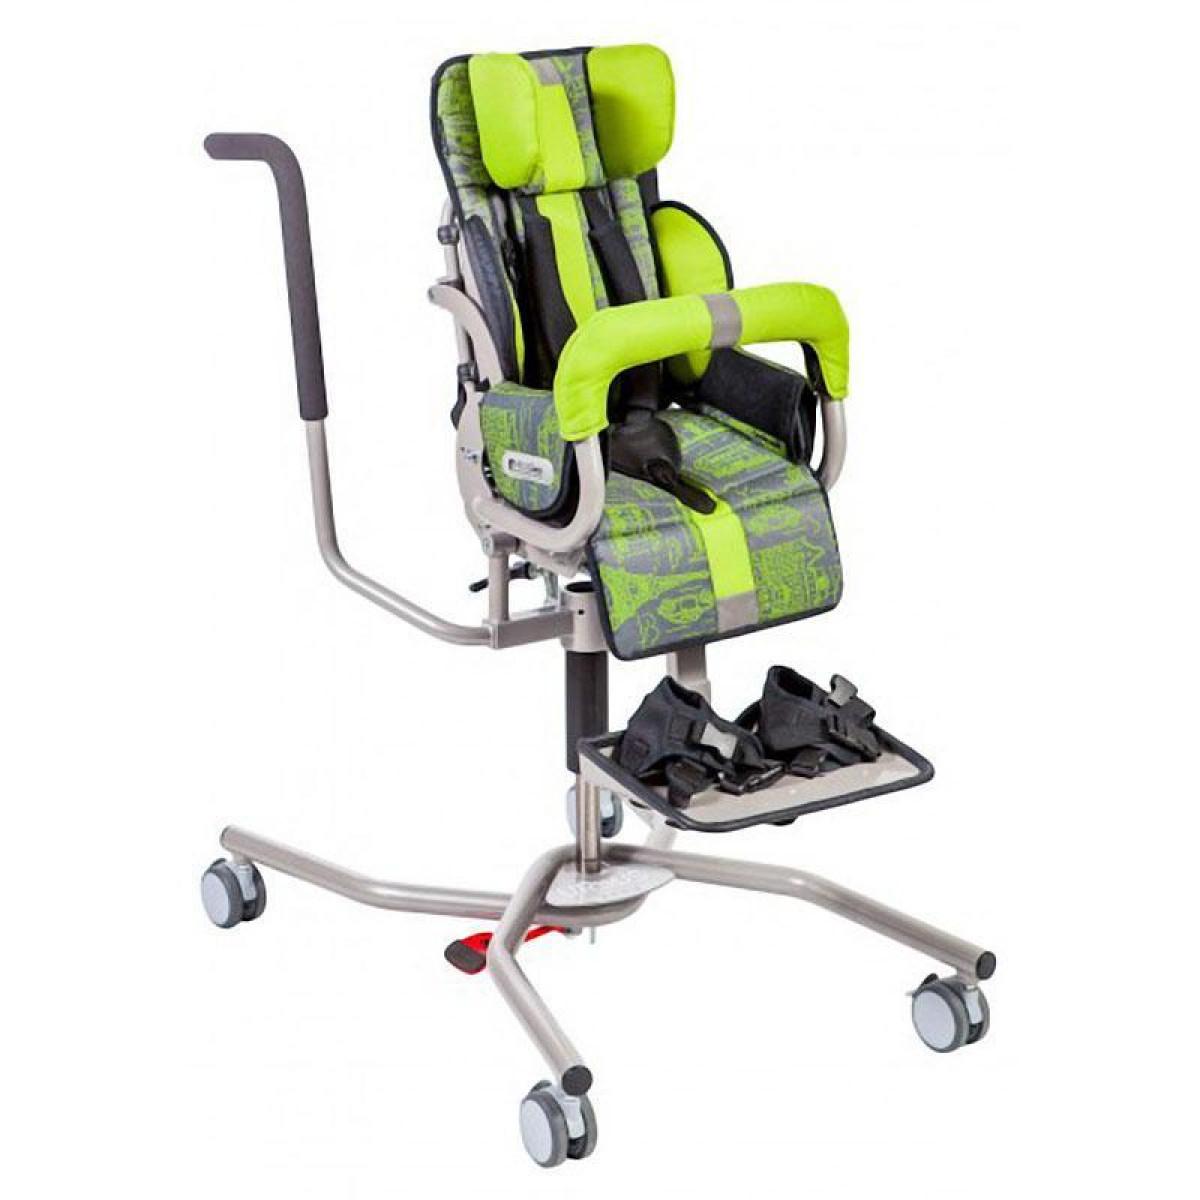 Детская комнатная кресло-коляска ДЦП Akcesmed Урсус Хоум